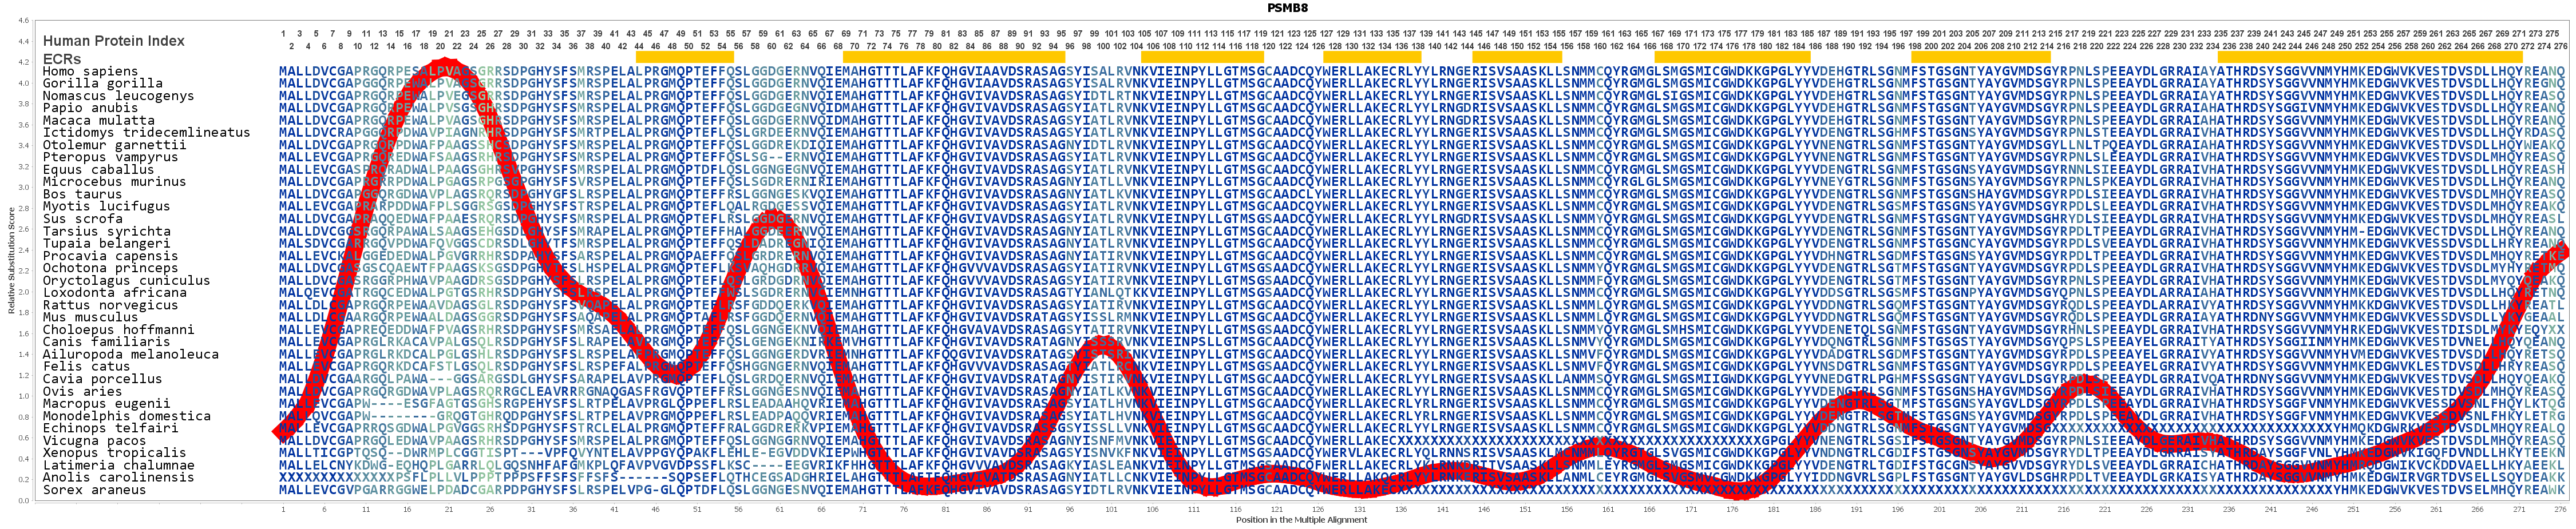 PSMB8 Gene - GeneCards | PSB8 Protein | PSB8 Antibody